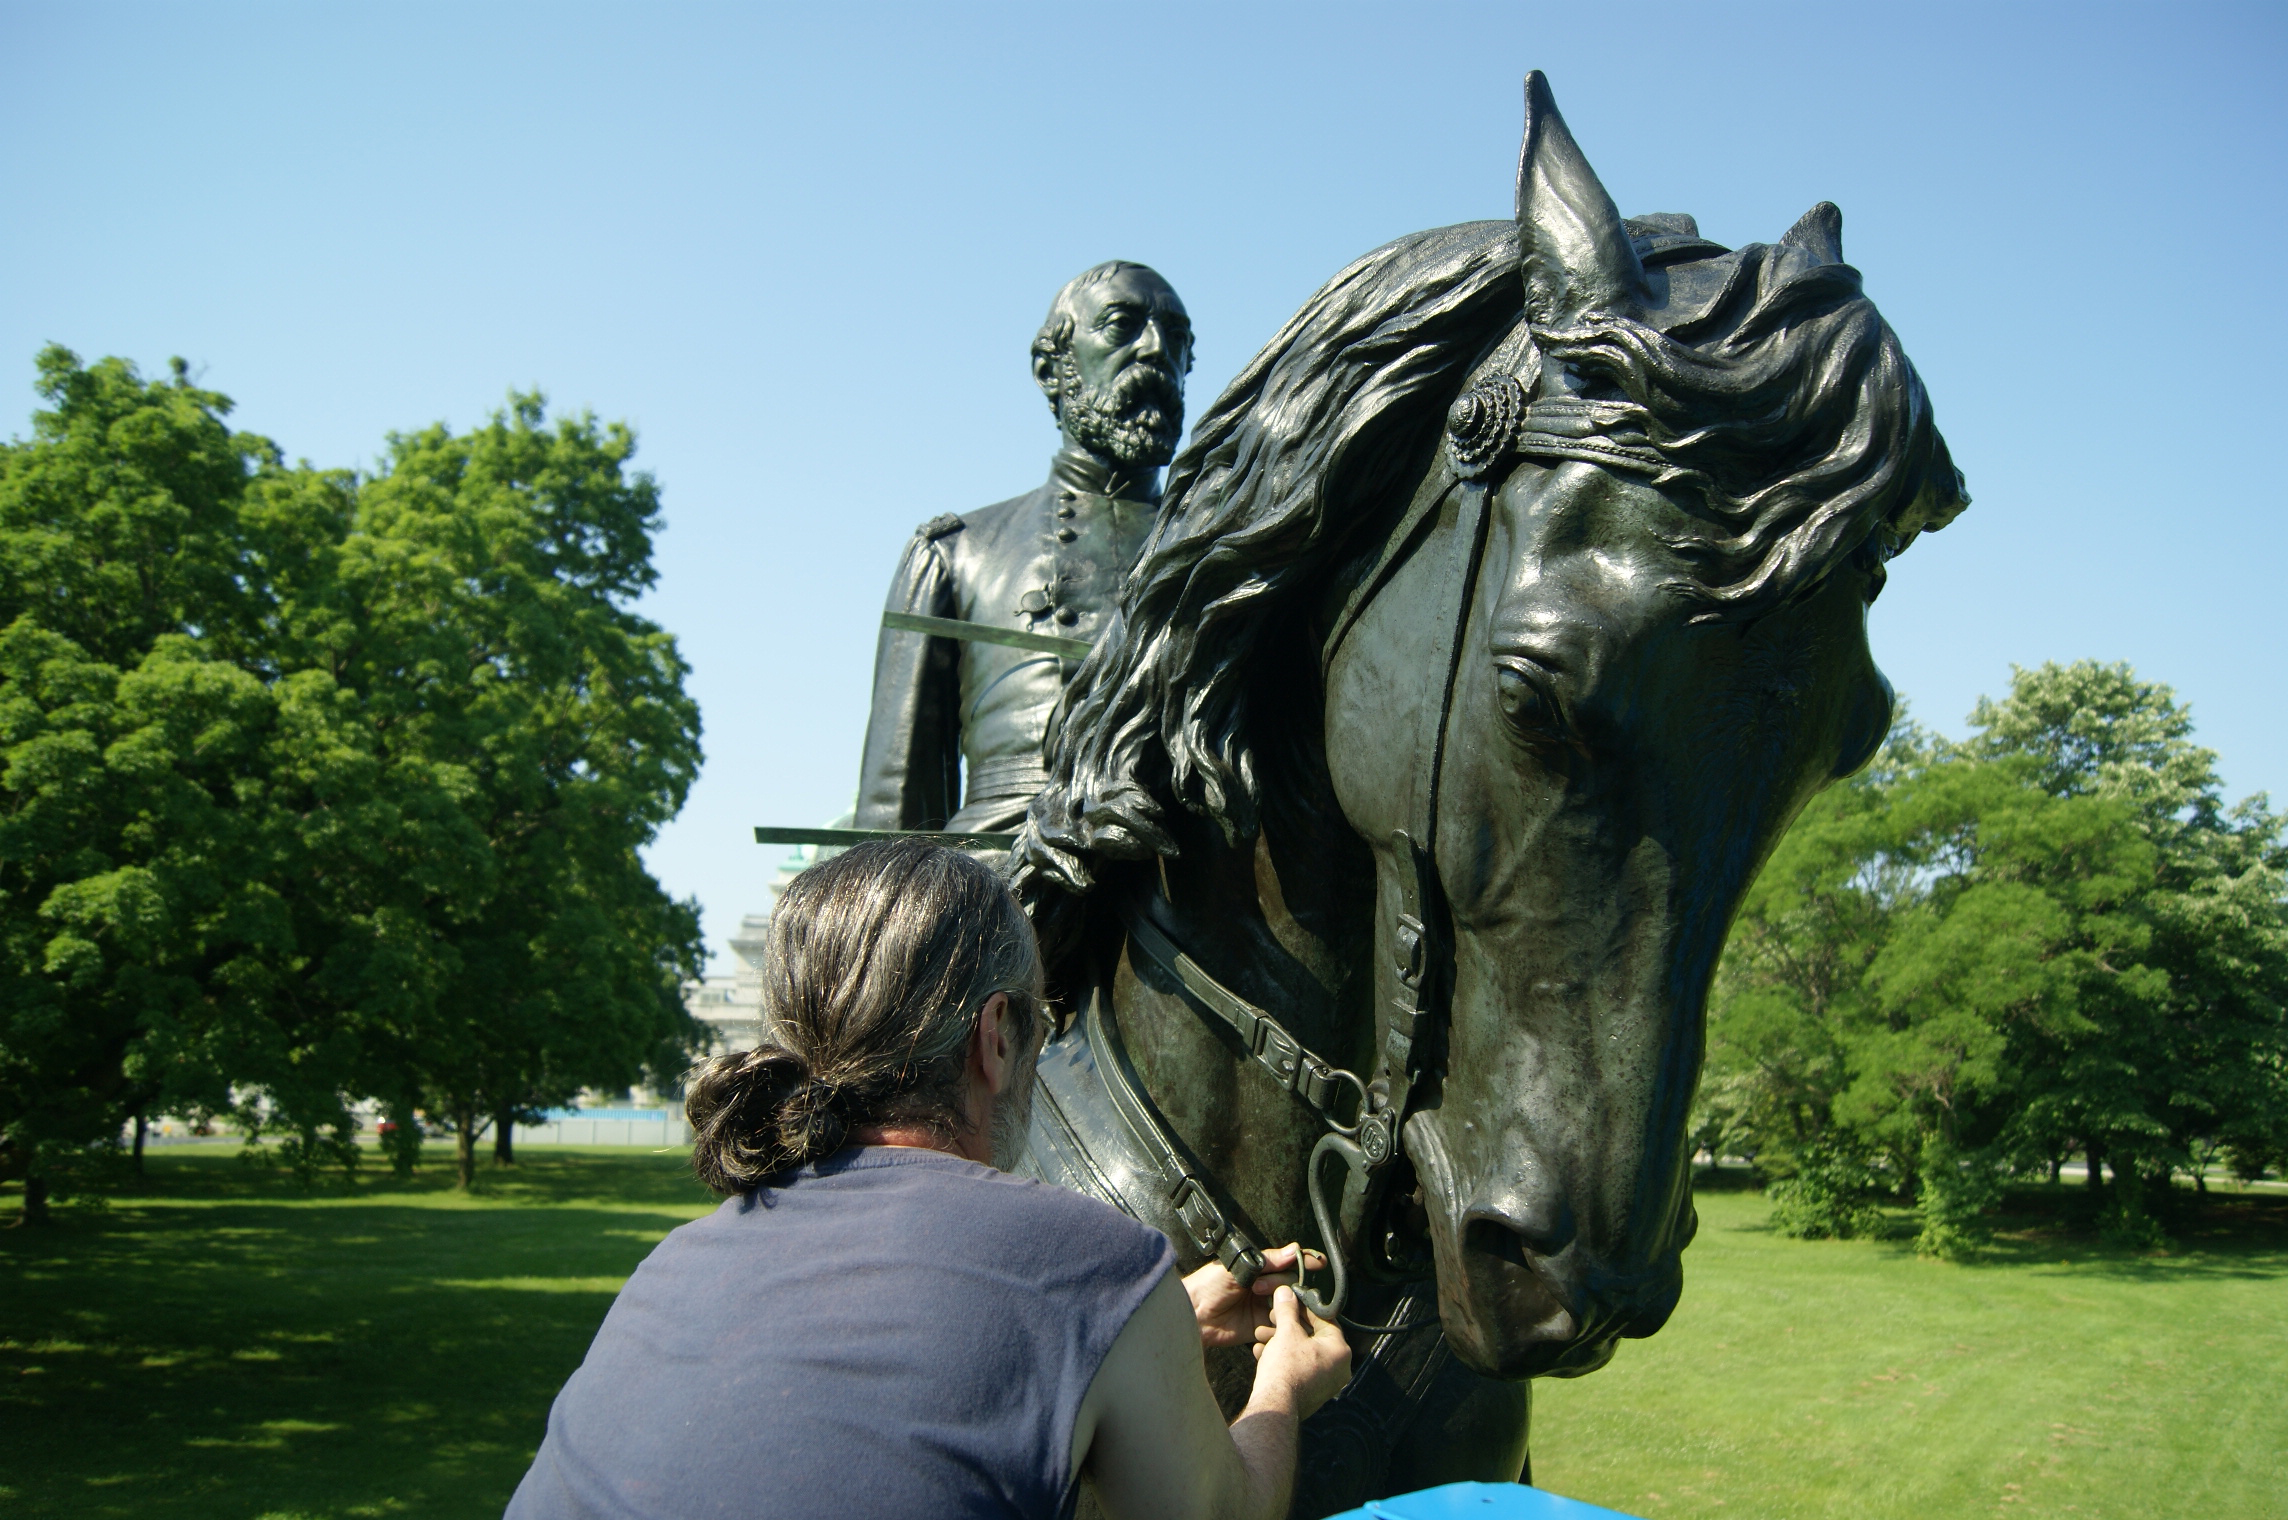 A conservator installs new horse reins for the bronze General Meade equestrian sculpture in Fairmount Park